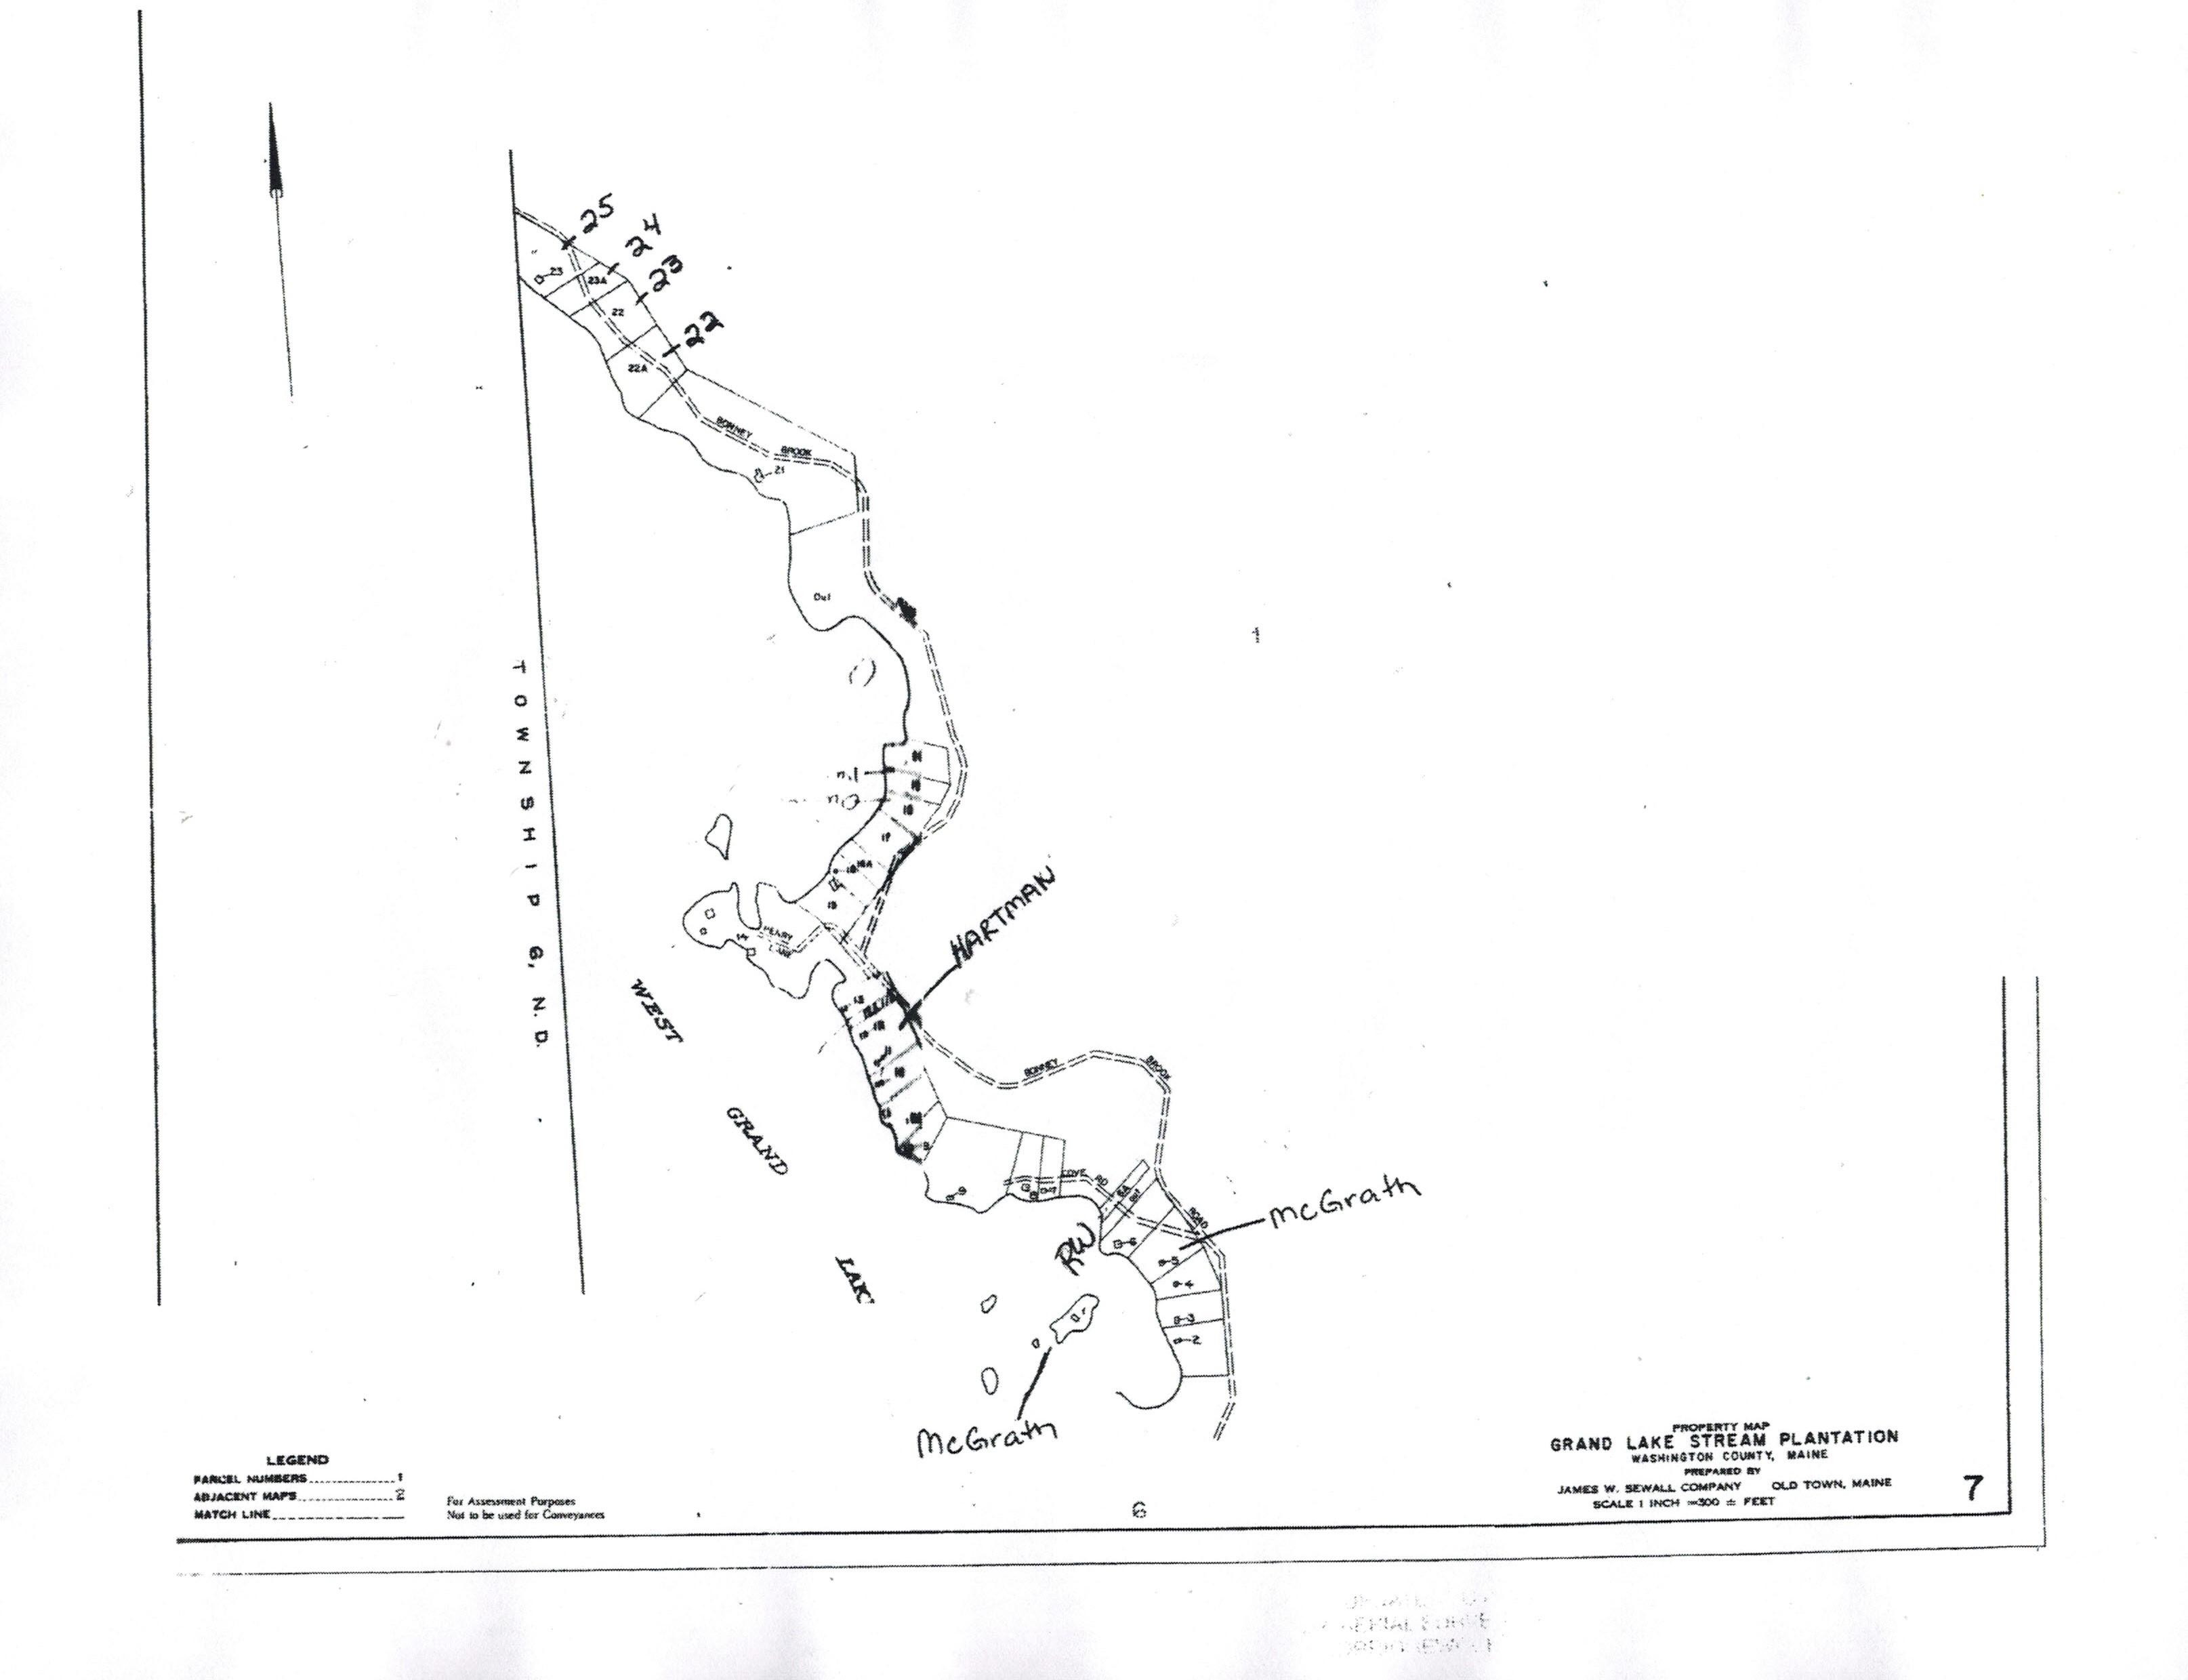 Grand Lake Stream Maine Map.Tax Maps Grand Lake Stream Maine